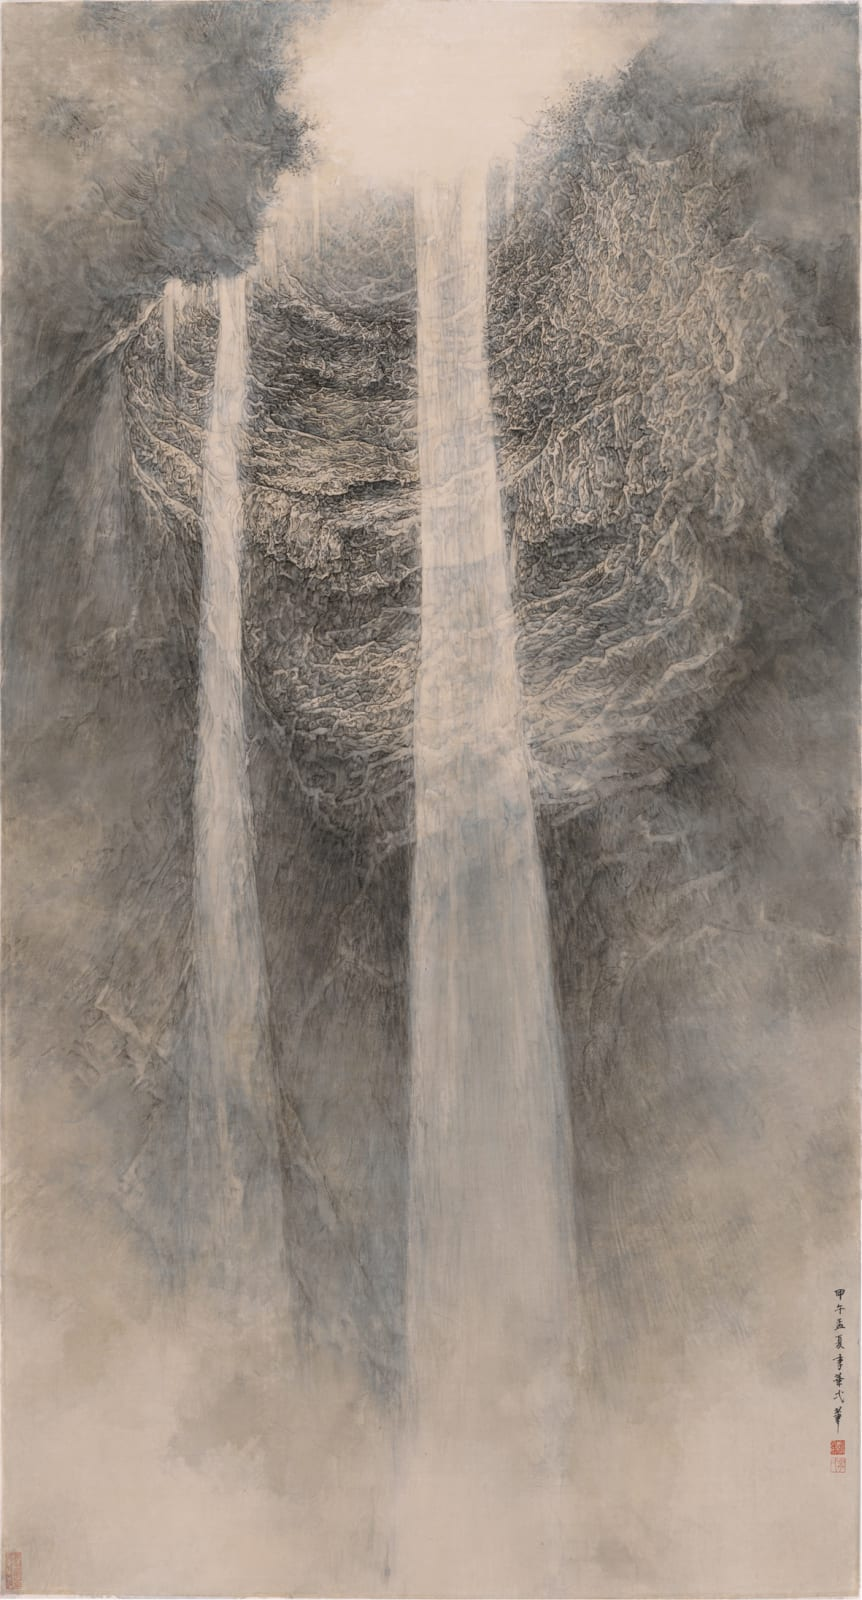 Li Huayi 李華弌, Untitled 《無題》, 2014